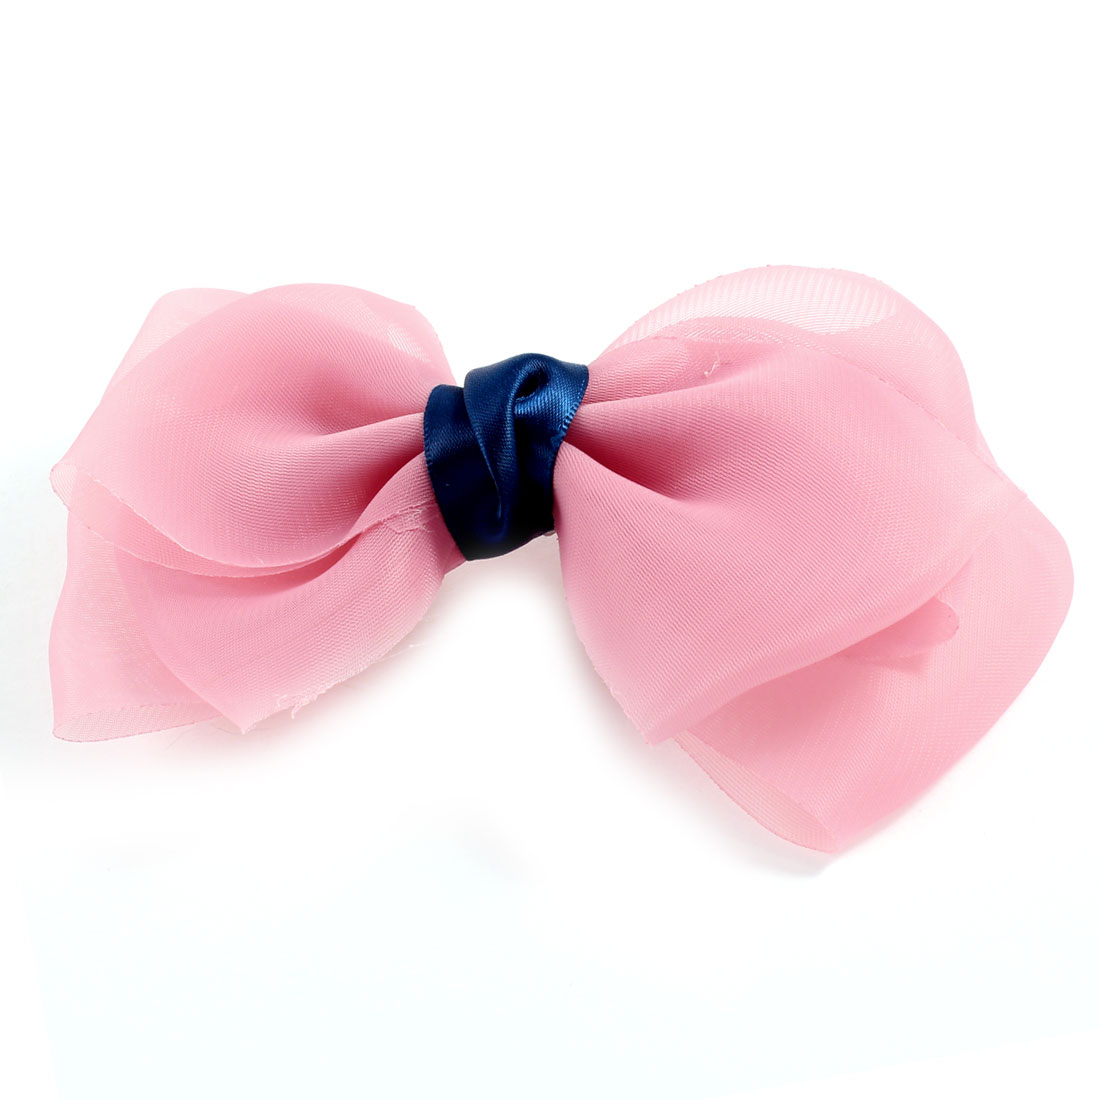 Lady Pale Pink Triplex Organza Bowknot Decoration Alligator Hair Clip